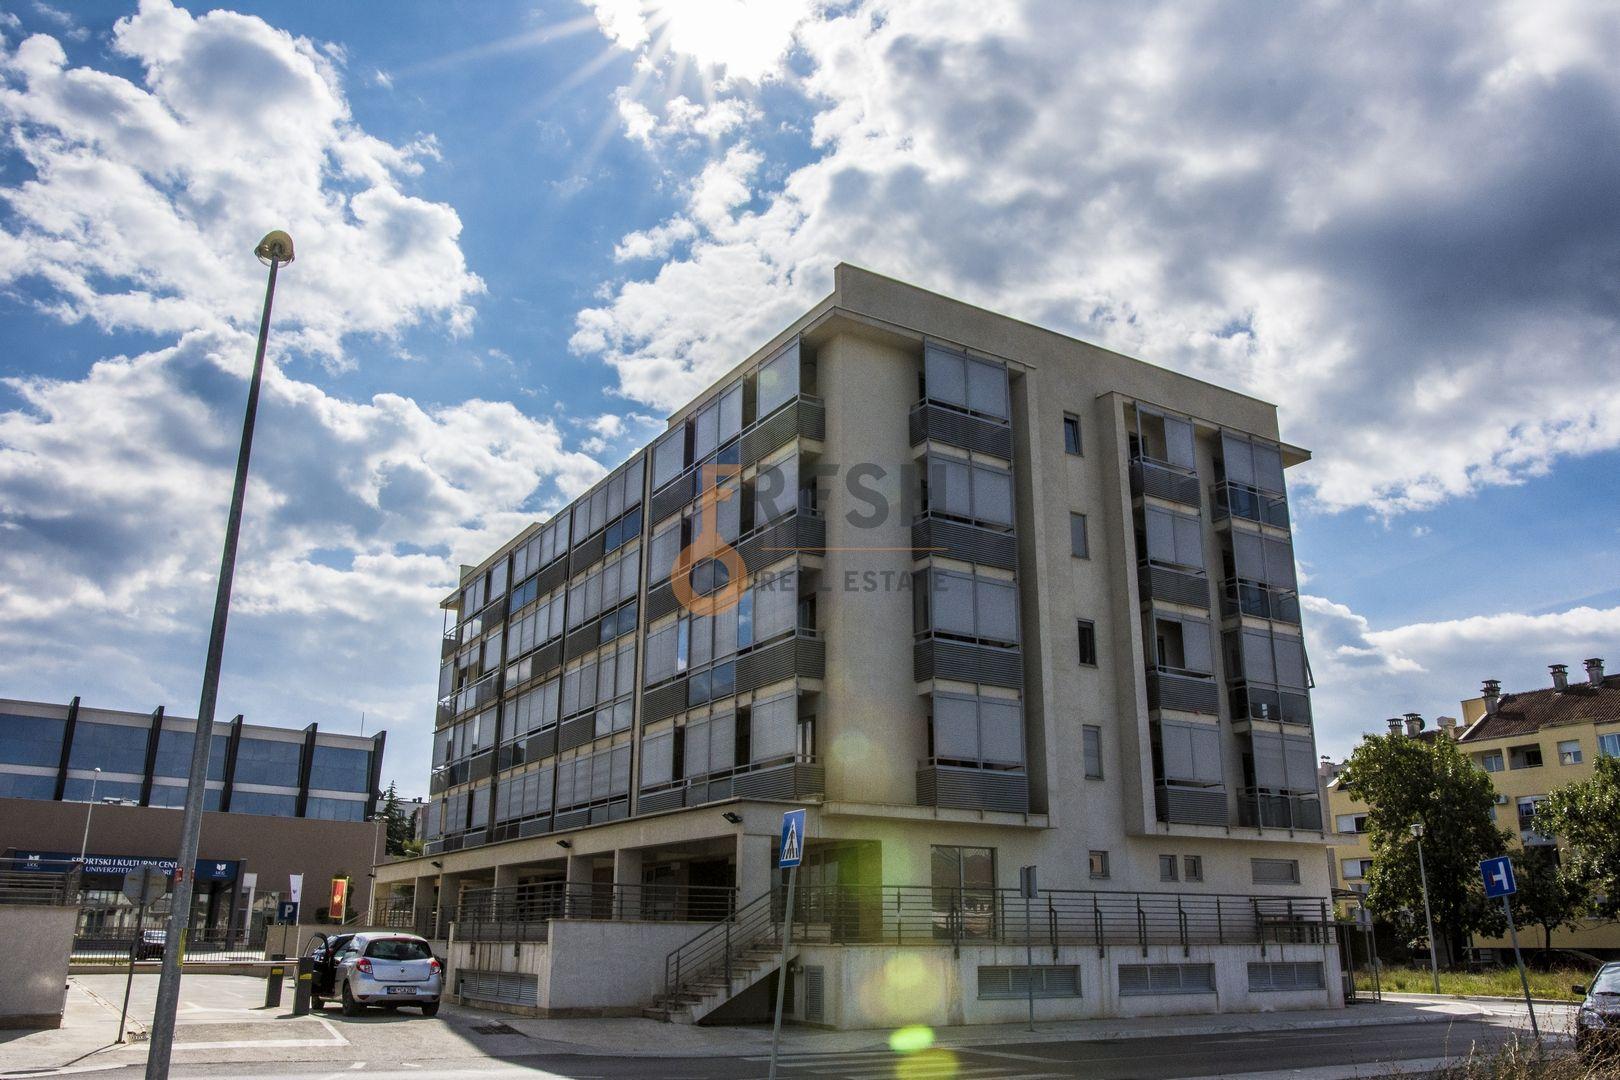 Dvosobni luksuzni stanovi, 92m2, Tološi, Prodaja - 1